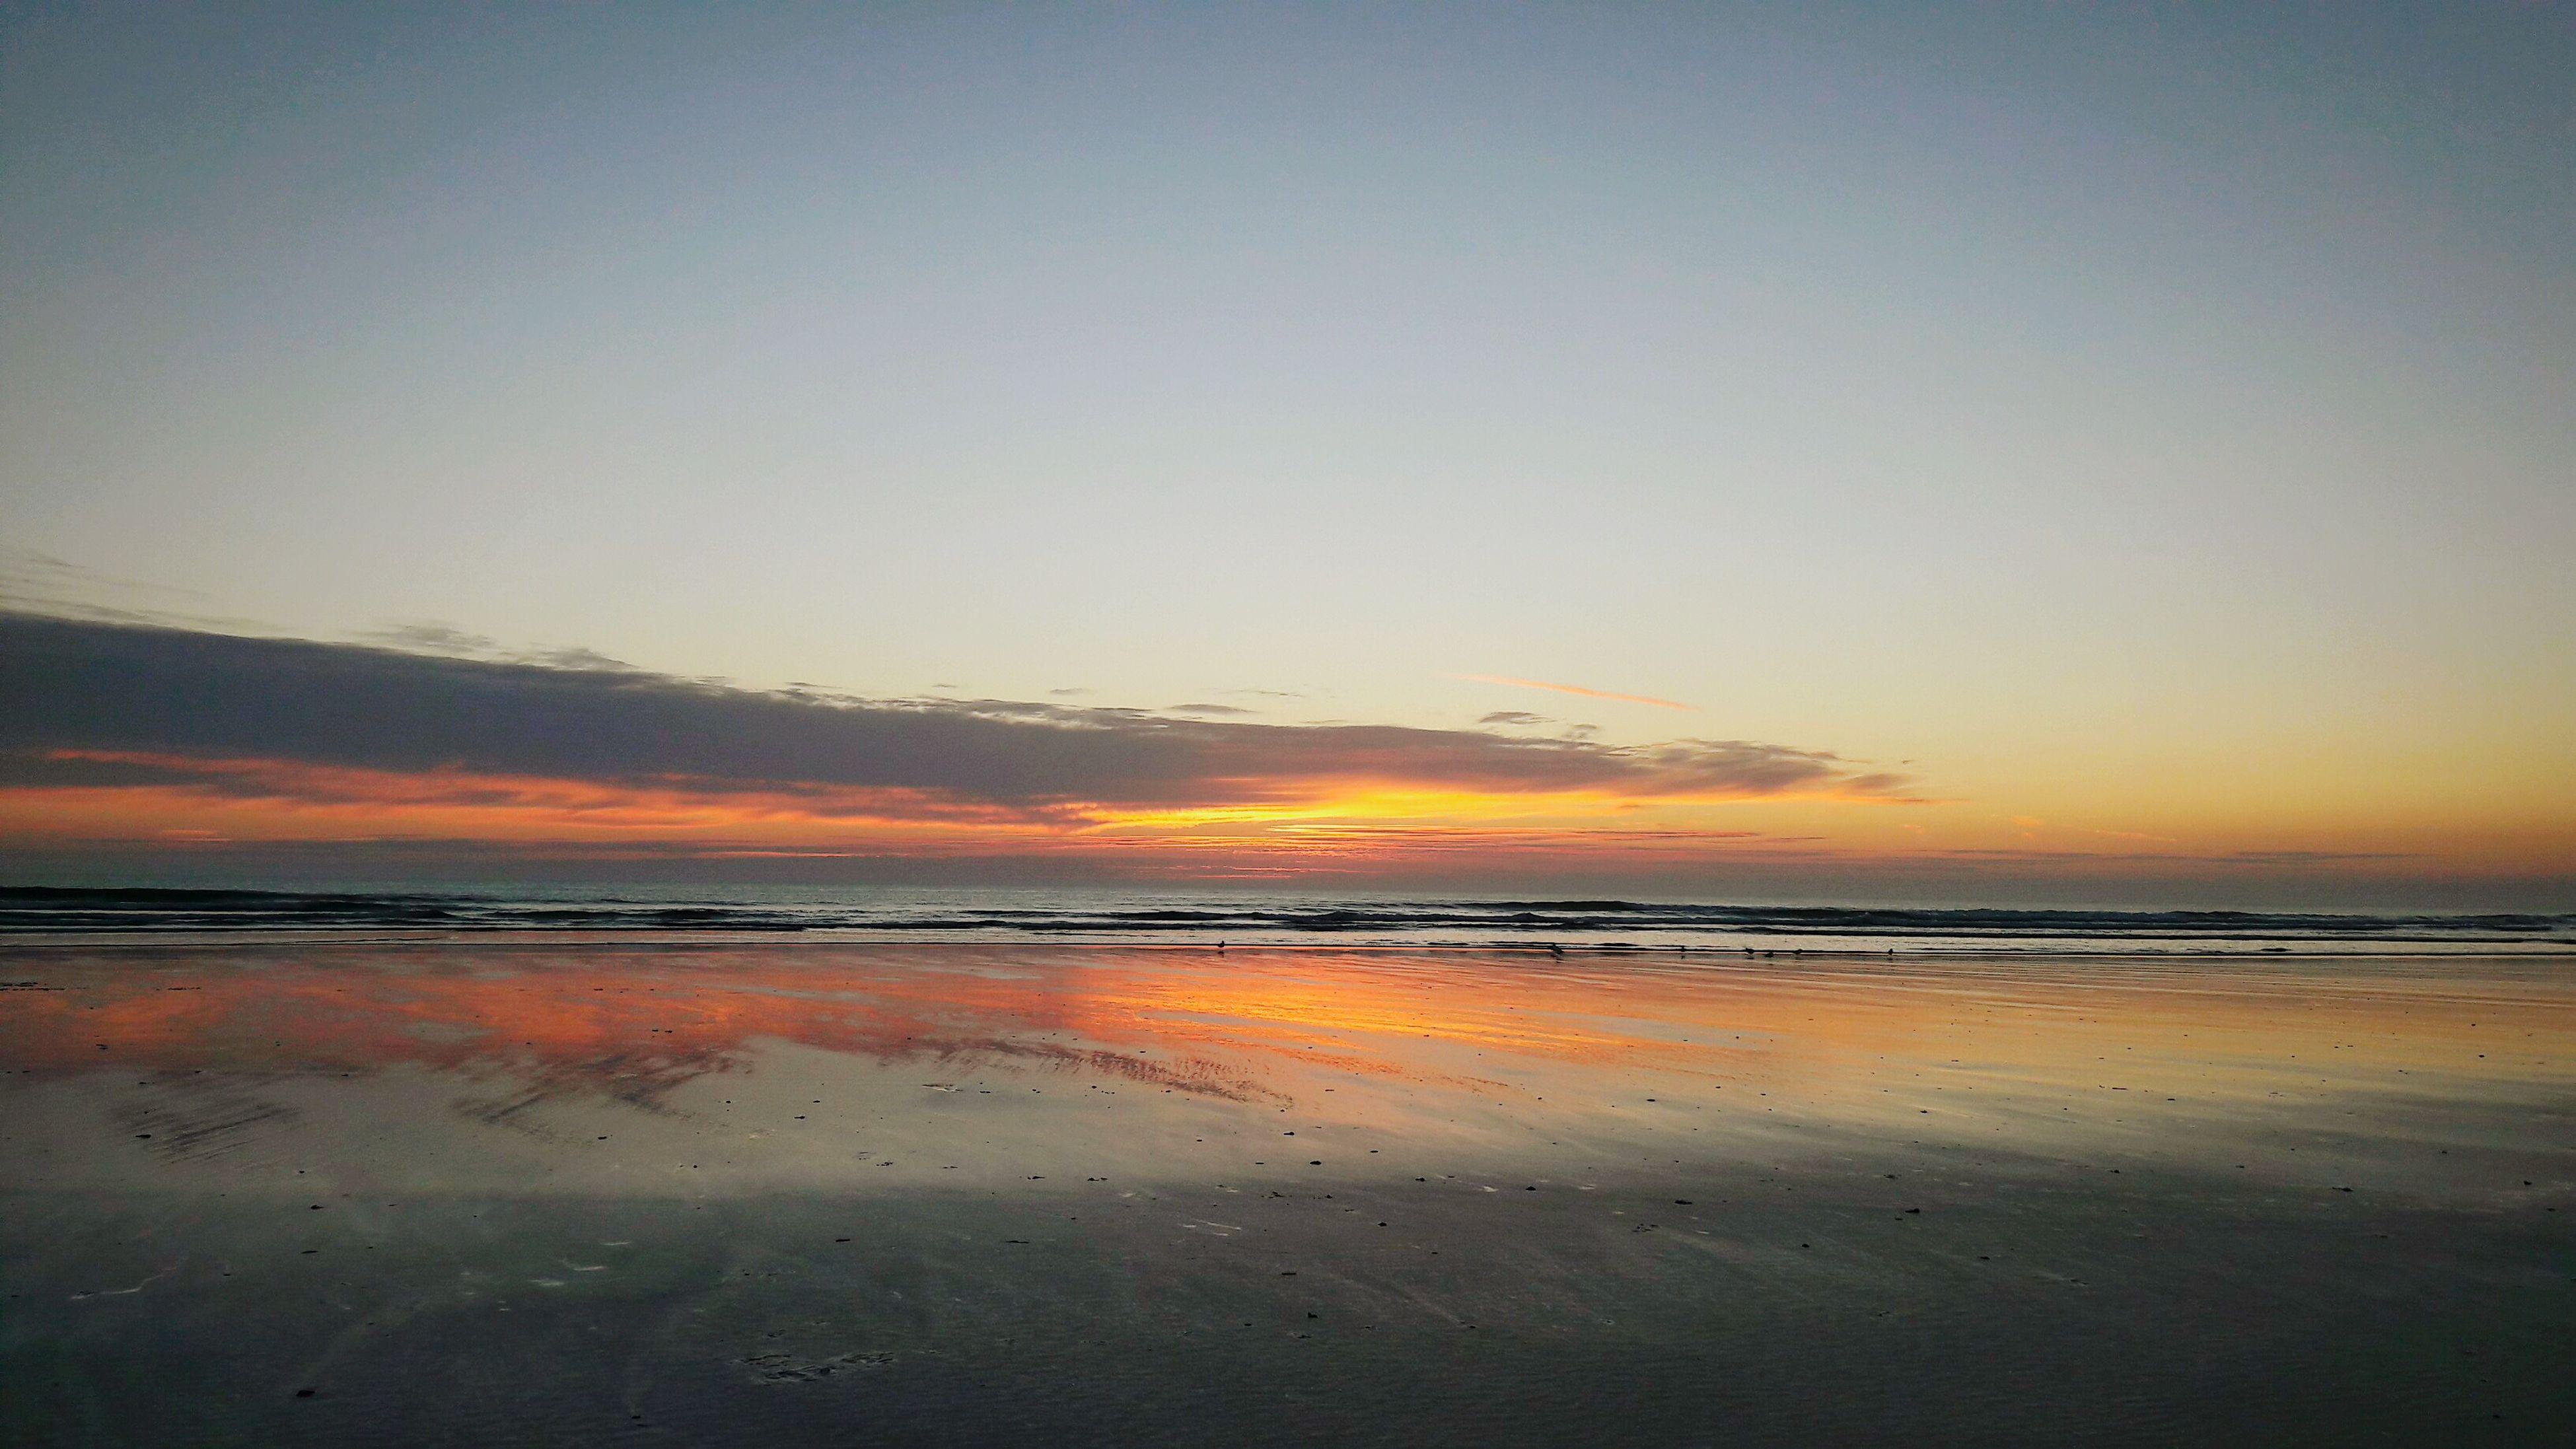 sunset, sea, beach, water, horizon over water, scenics, tranquil scene, tranquility, beauty in nature, idyllic, calm, shore, orange color, reflection, nature, sky, sun, seascape, remote, coastline, ocean, non-urban scene, vacations, no people, waterfront, majestic, solitude, cloud - sky, romantic sky